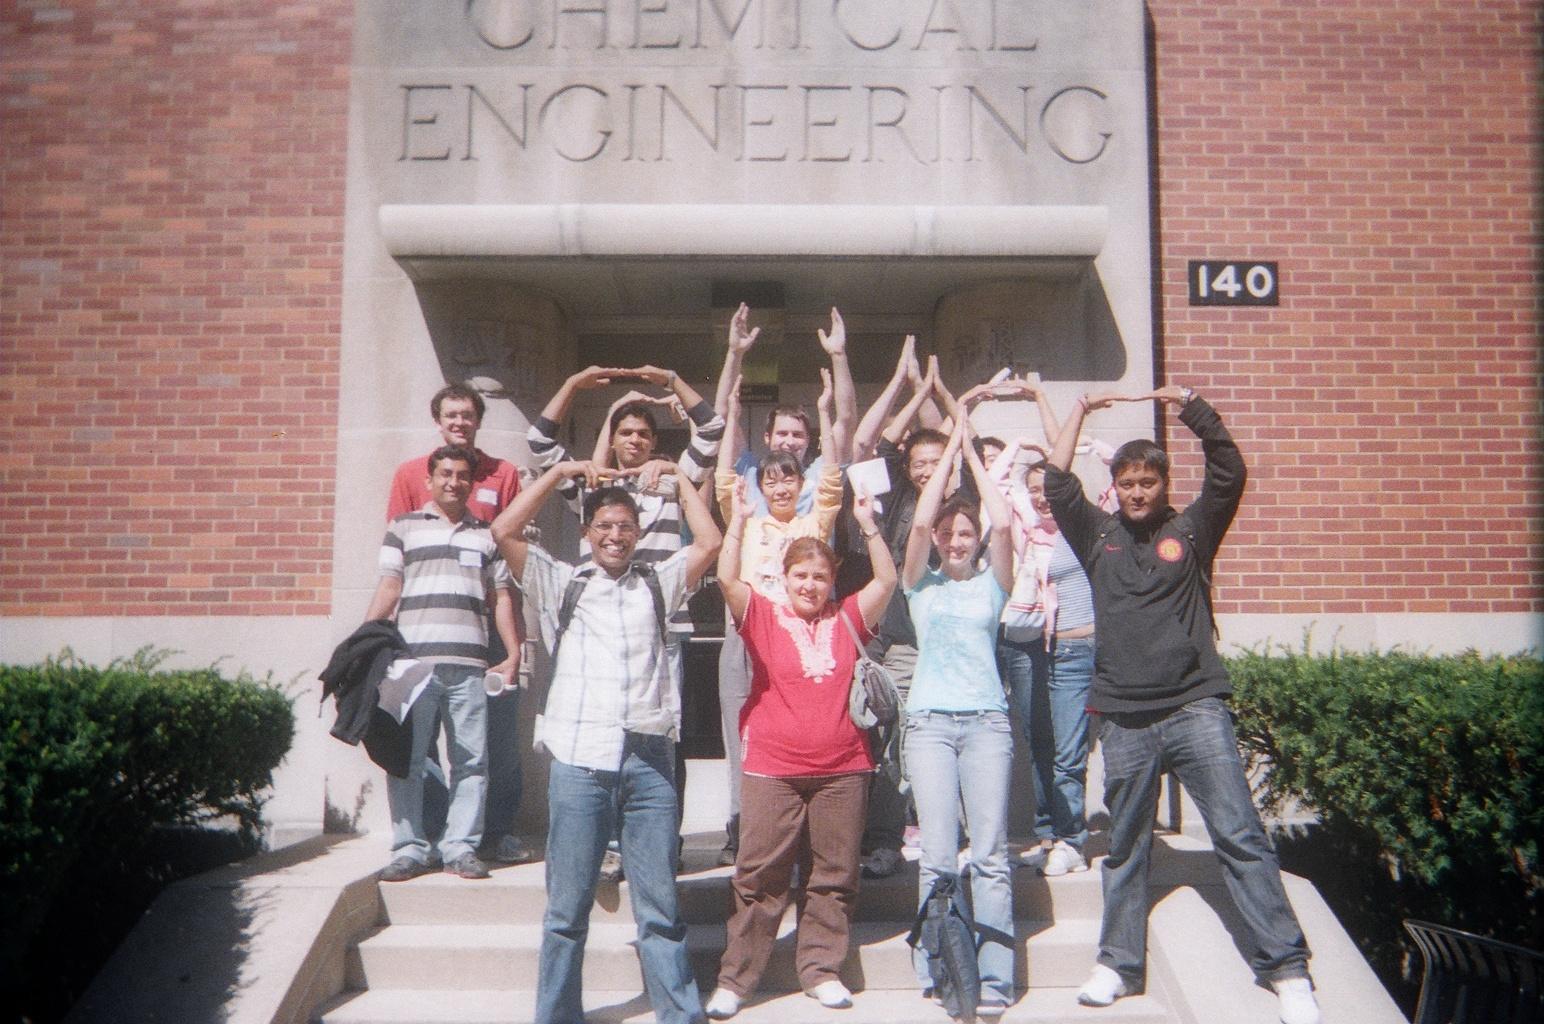 Ohio State University Industrial Engineering Ranking